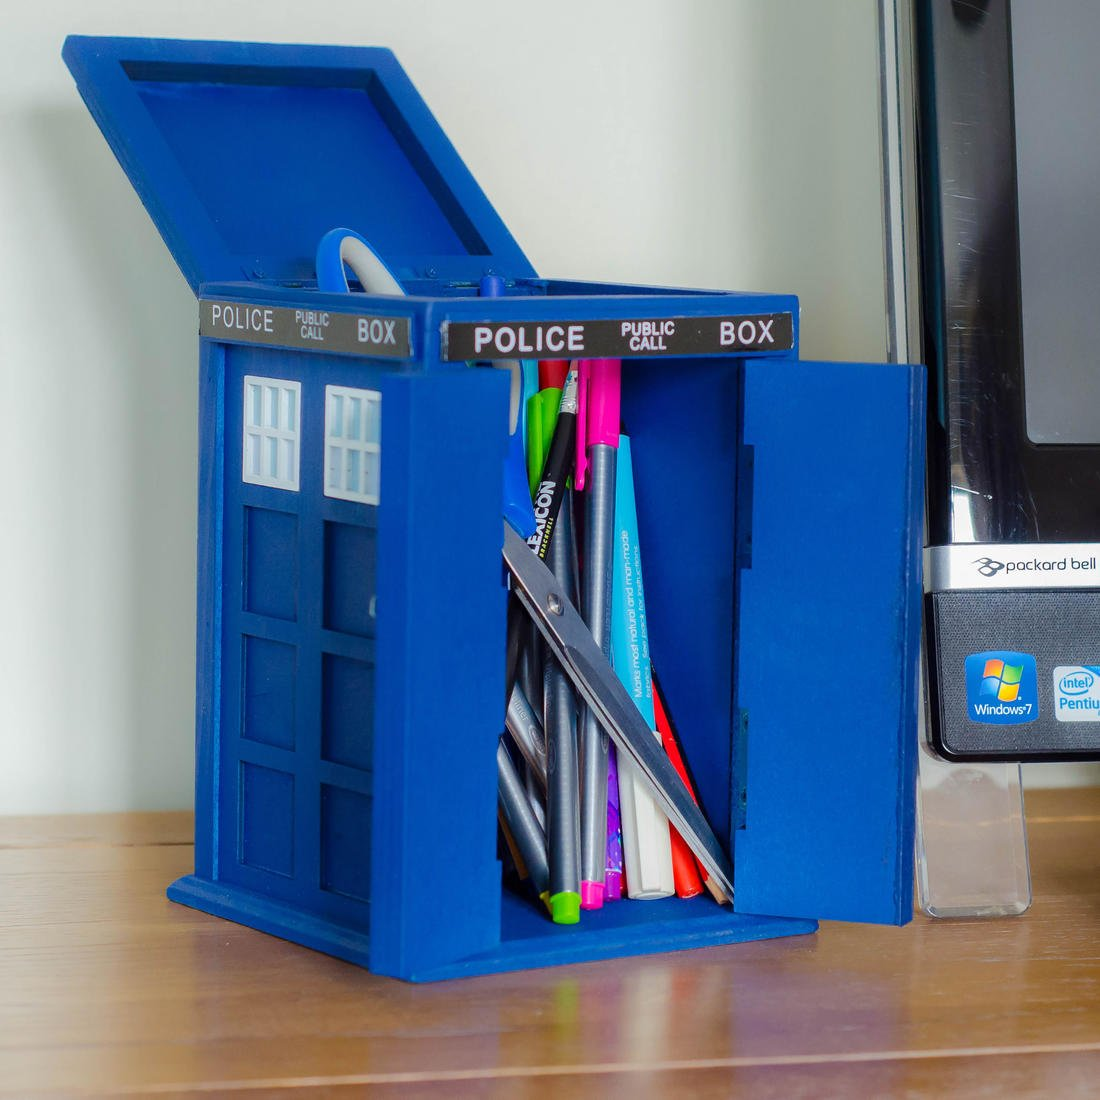 Lapicero de Dr Who, diseño de la TARDIS de Doctor Who.